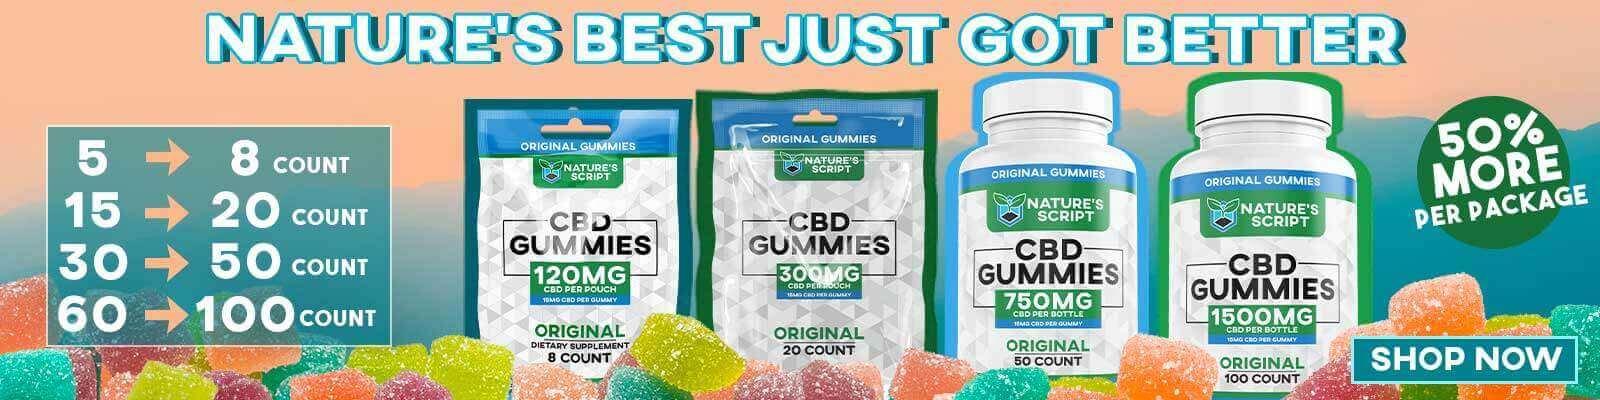 Nature's Script Best CBD Coupons Gummies